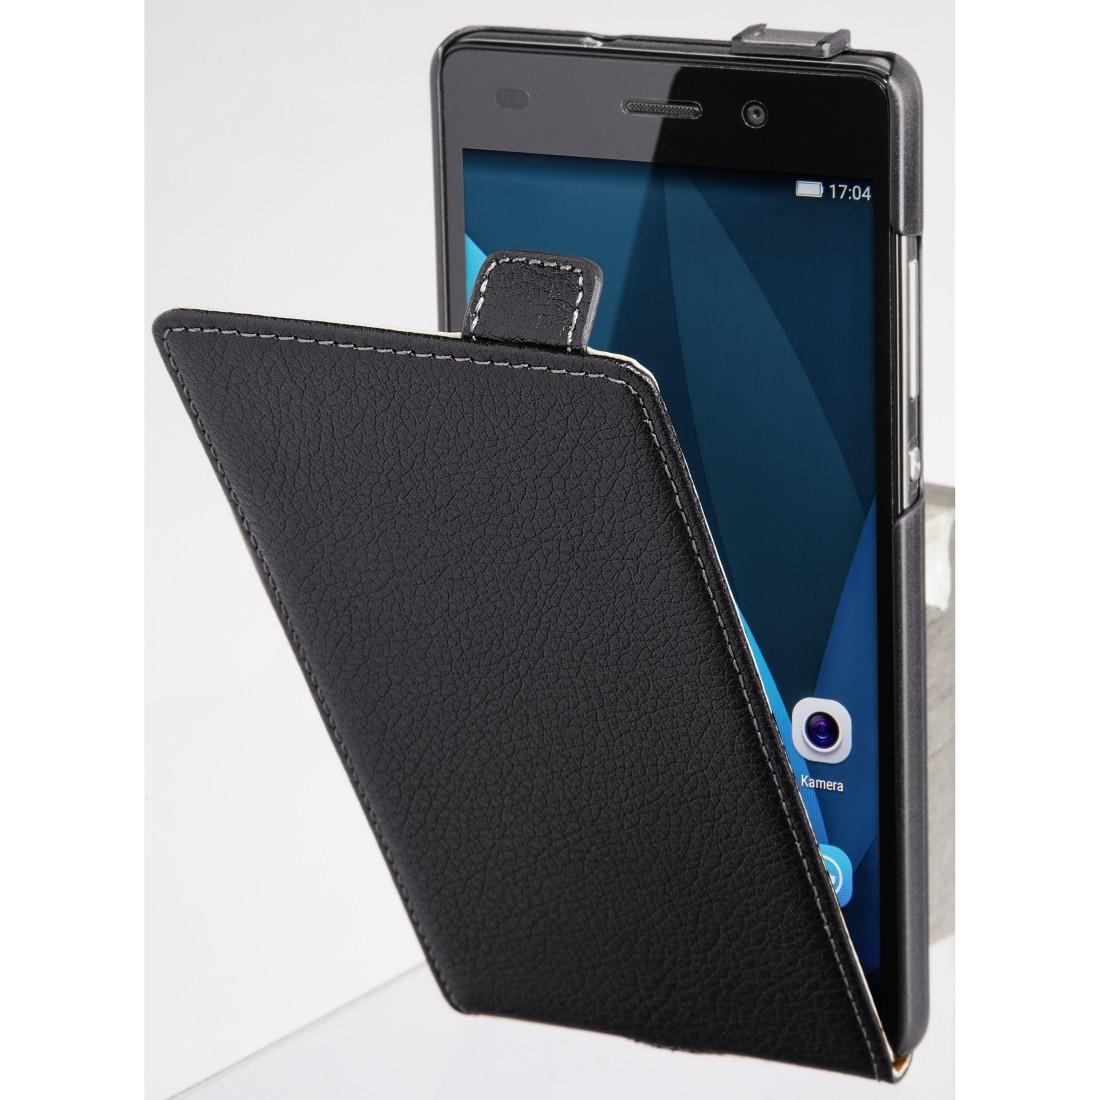 hama smartphone case